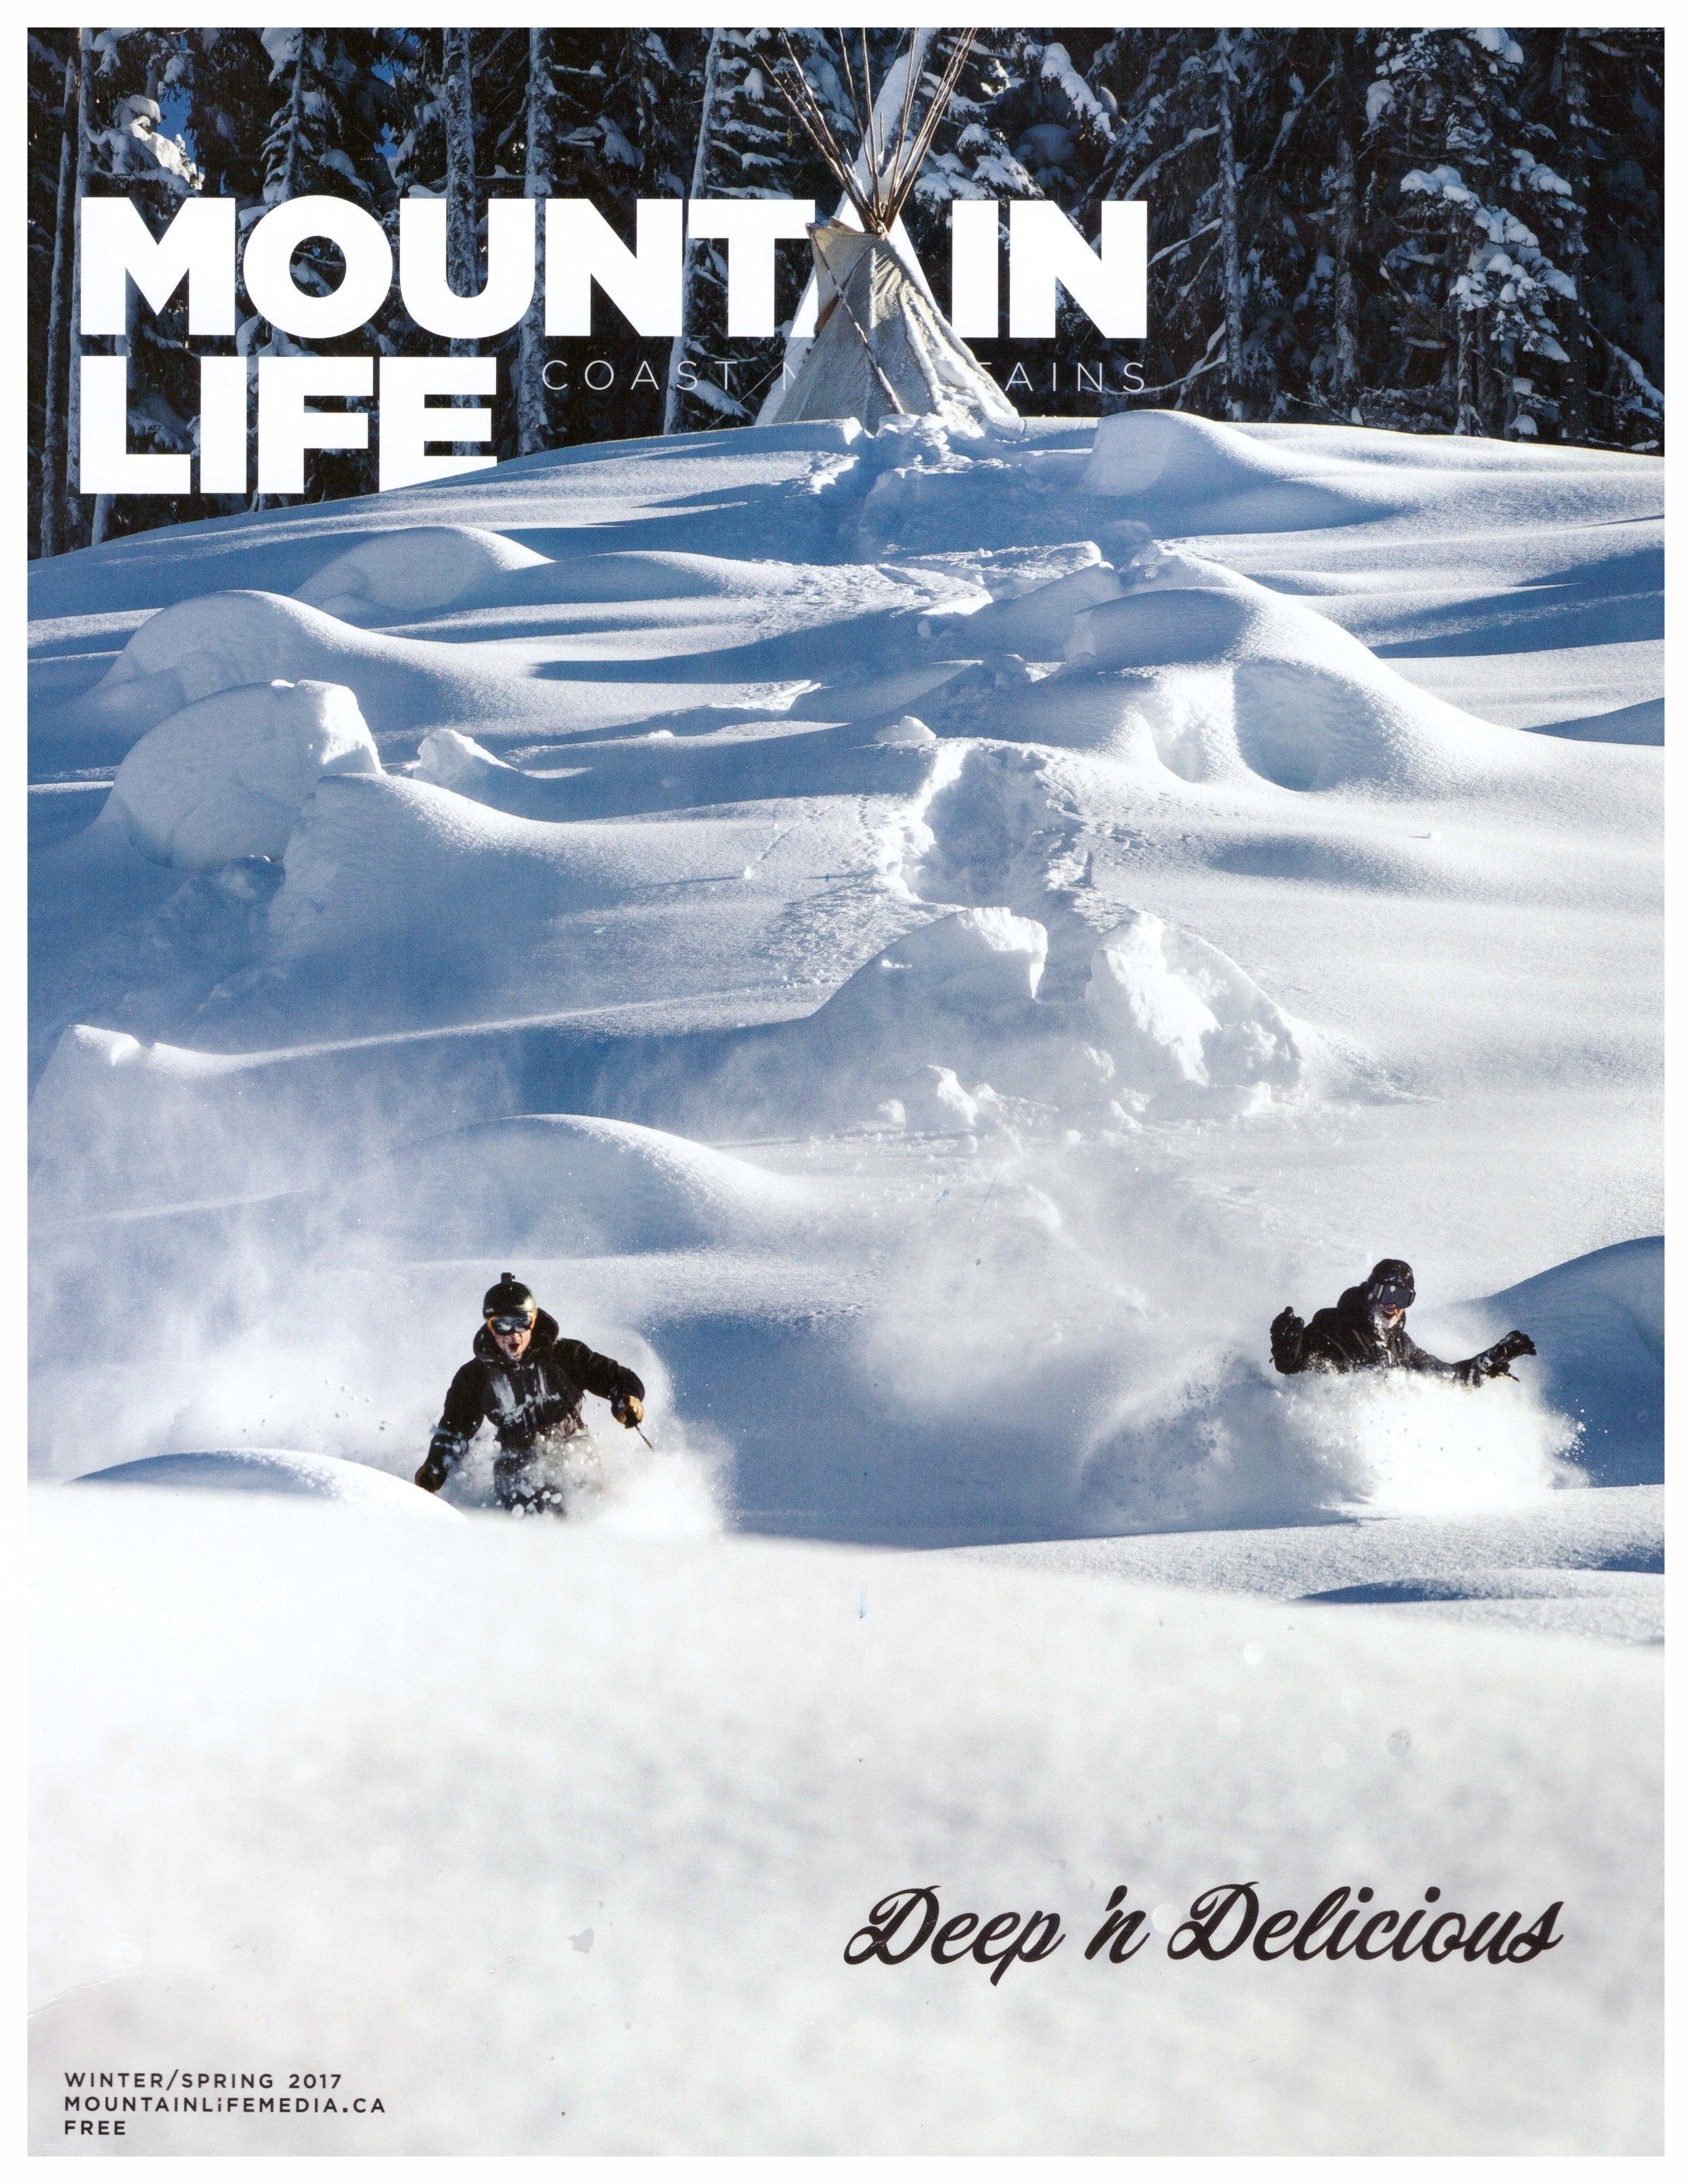 Mountain Life Cover 2.jpg